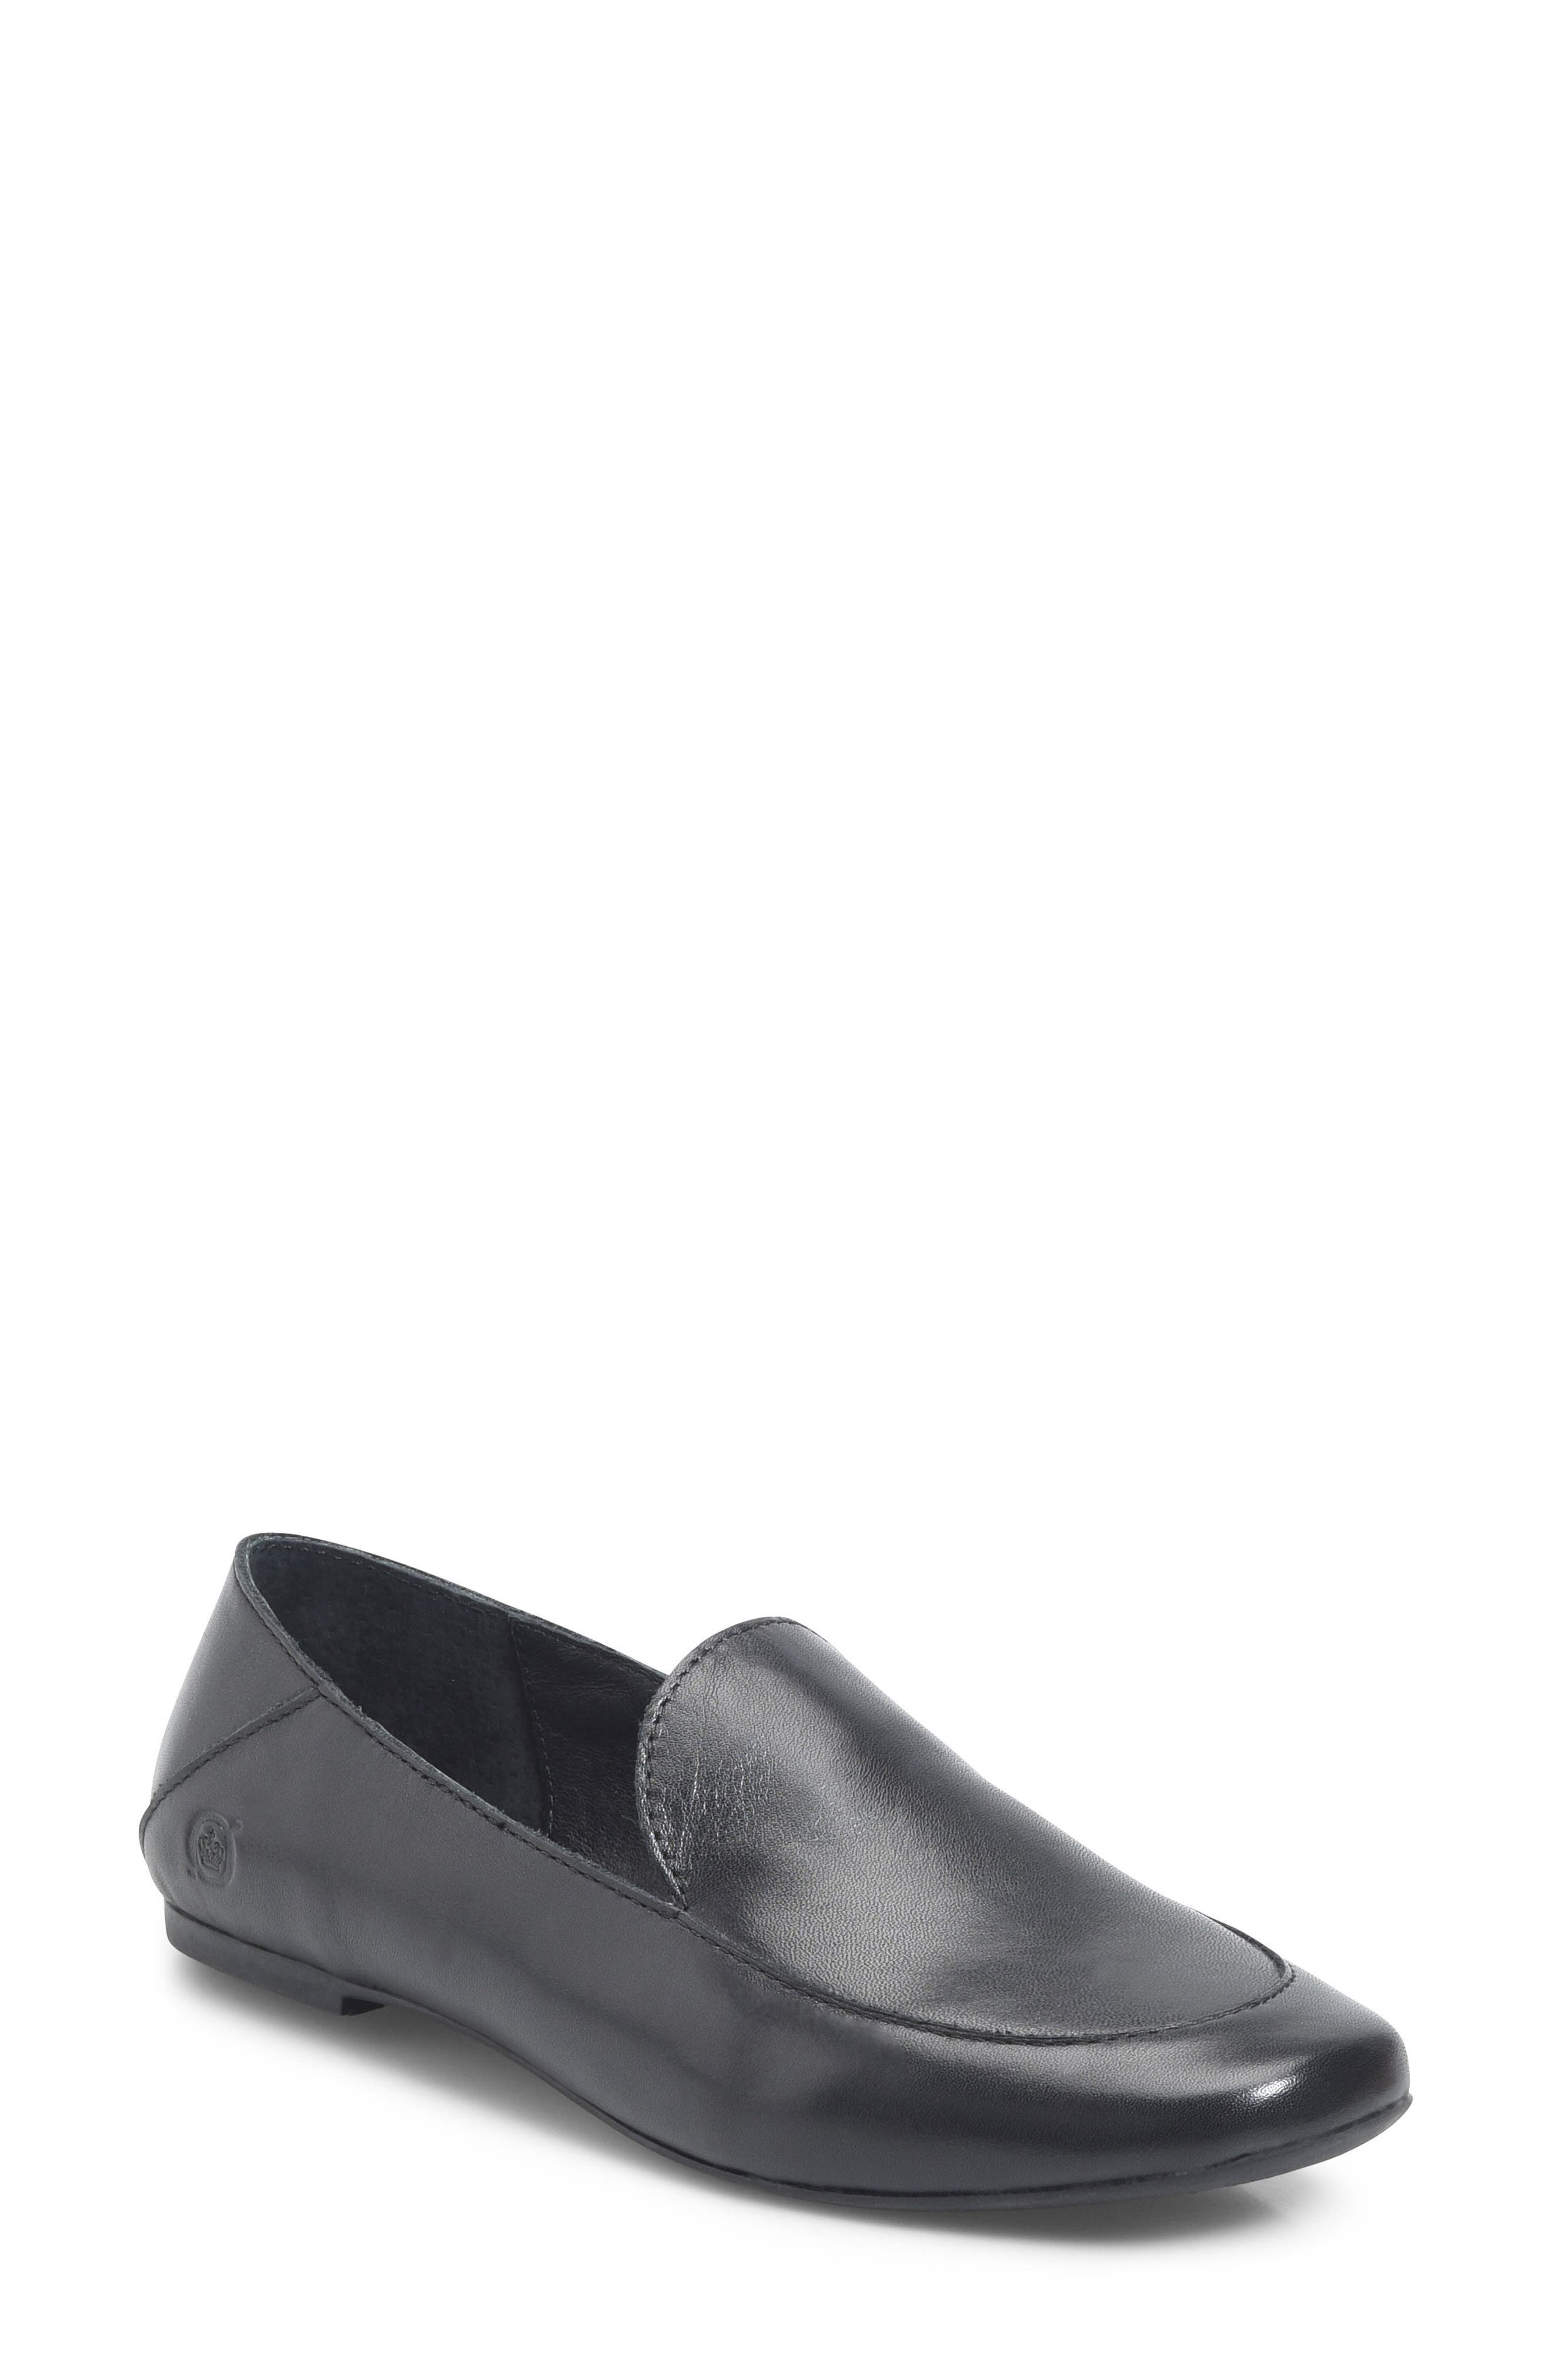 Carib Loafer,                             Main thumbnail 1, color,                             Black Leather